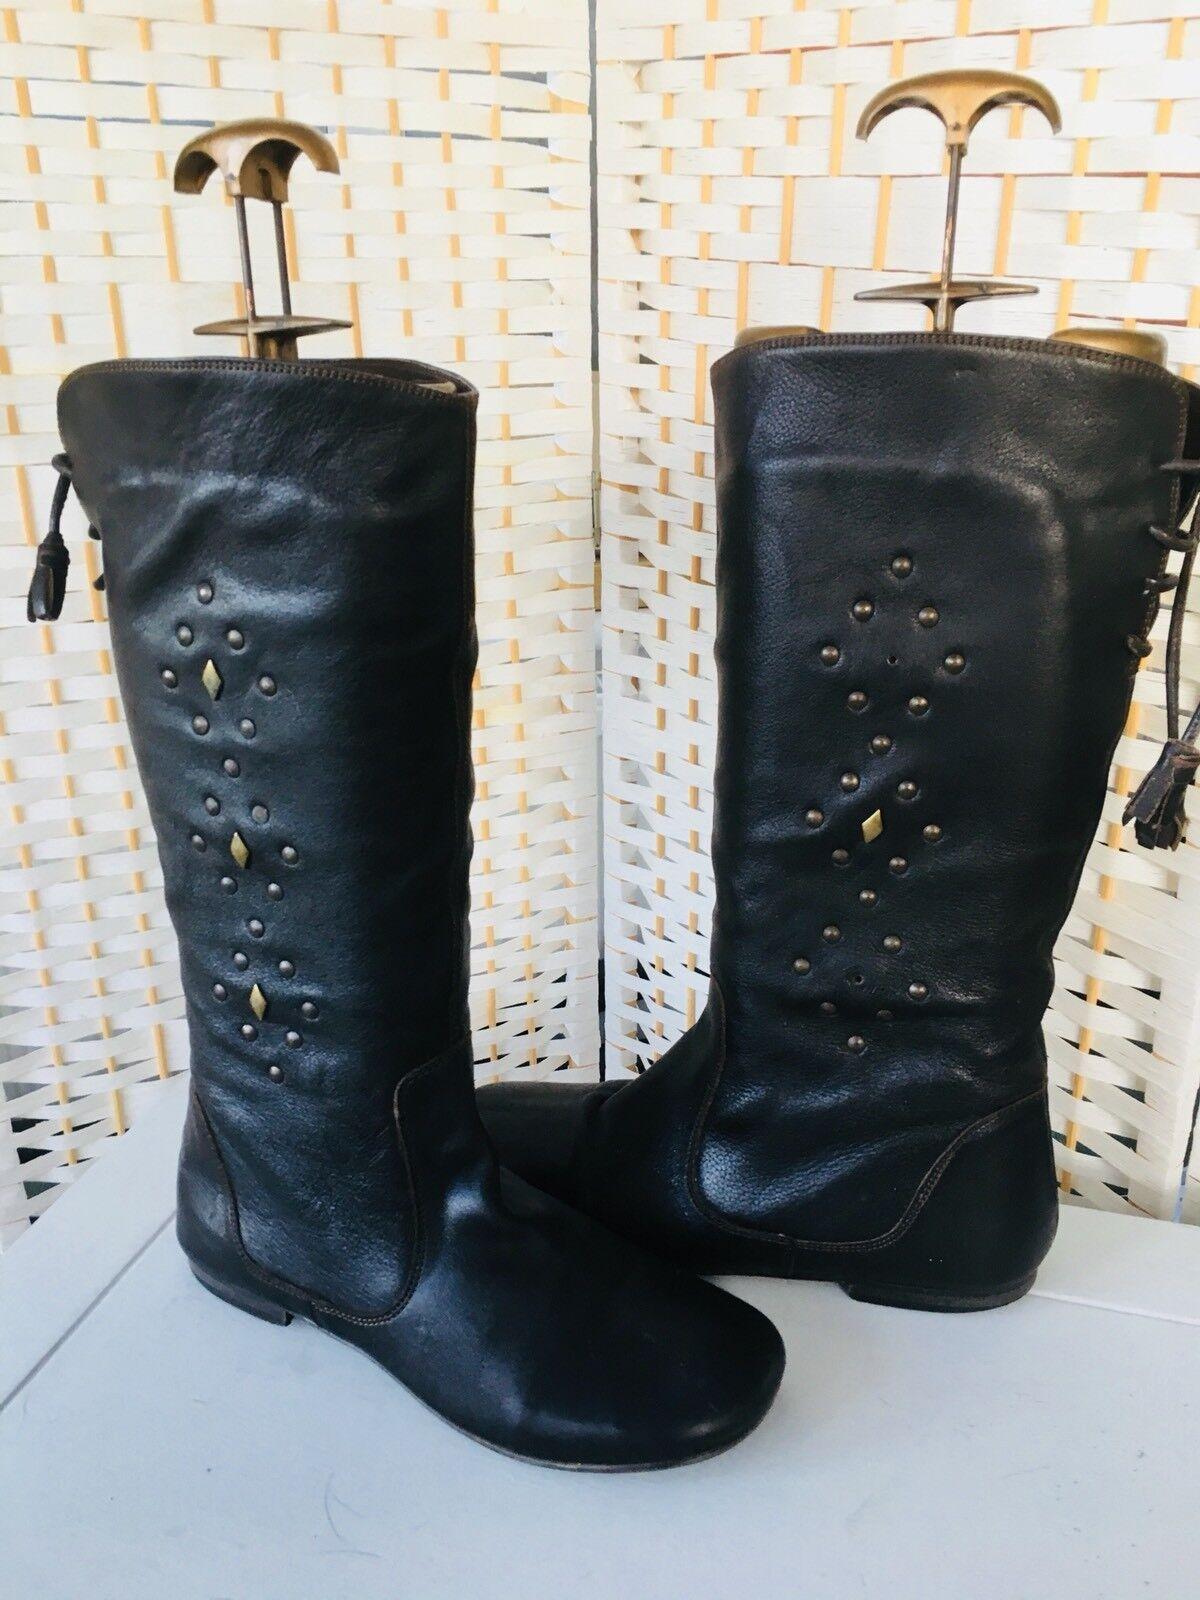 BHS Brown Leather Knee High Boots UK 7 / 40 Flat Heels Stud Decor Tassel Backs.